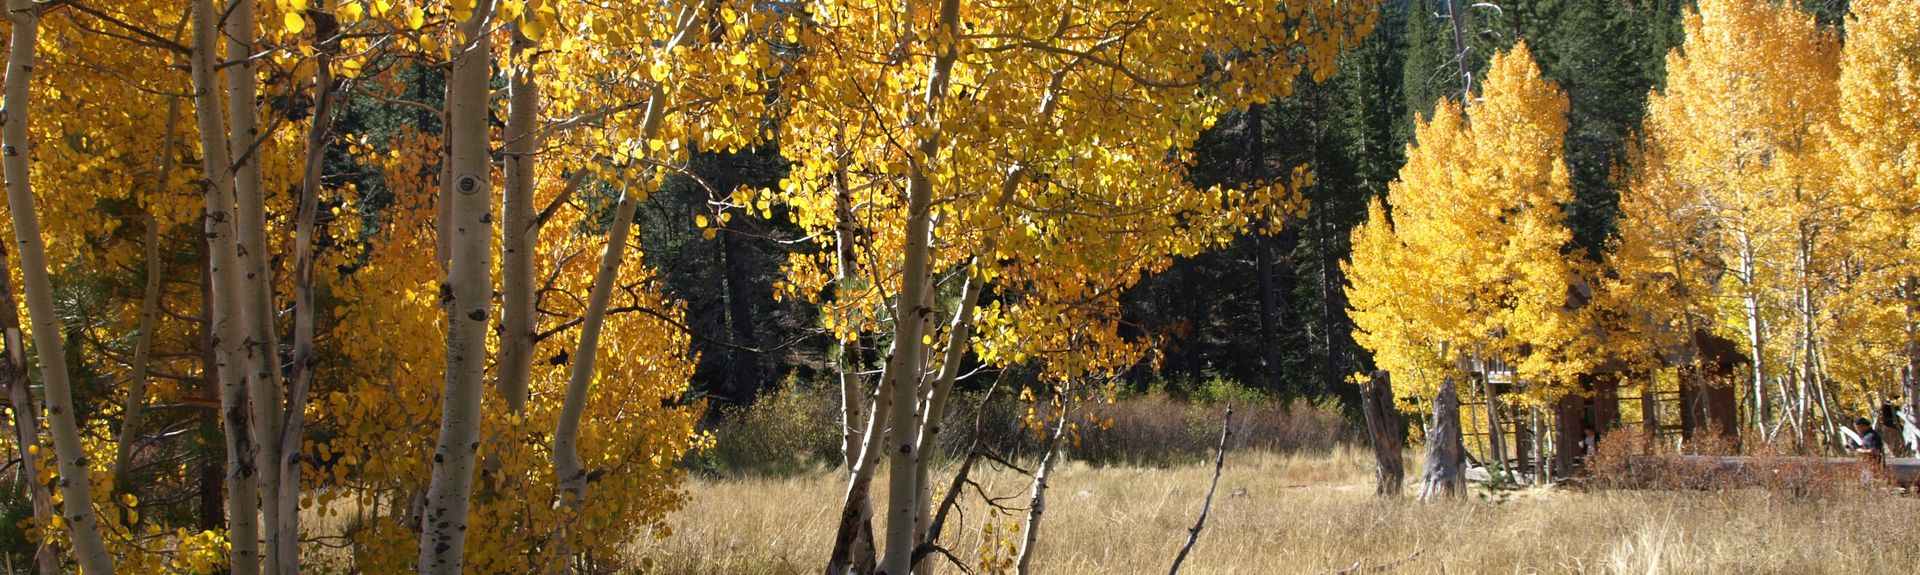 Carnelian Woods, Carnelian Bay, Californië, Verenigde Staten